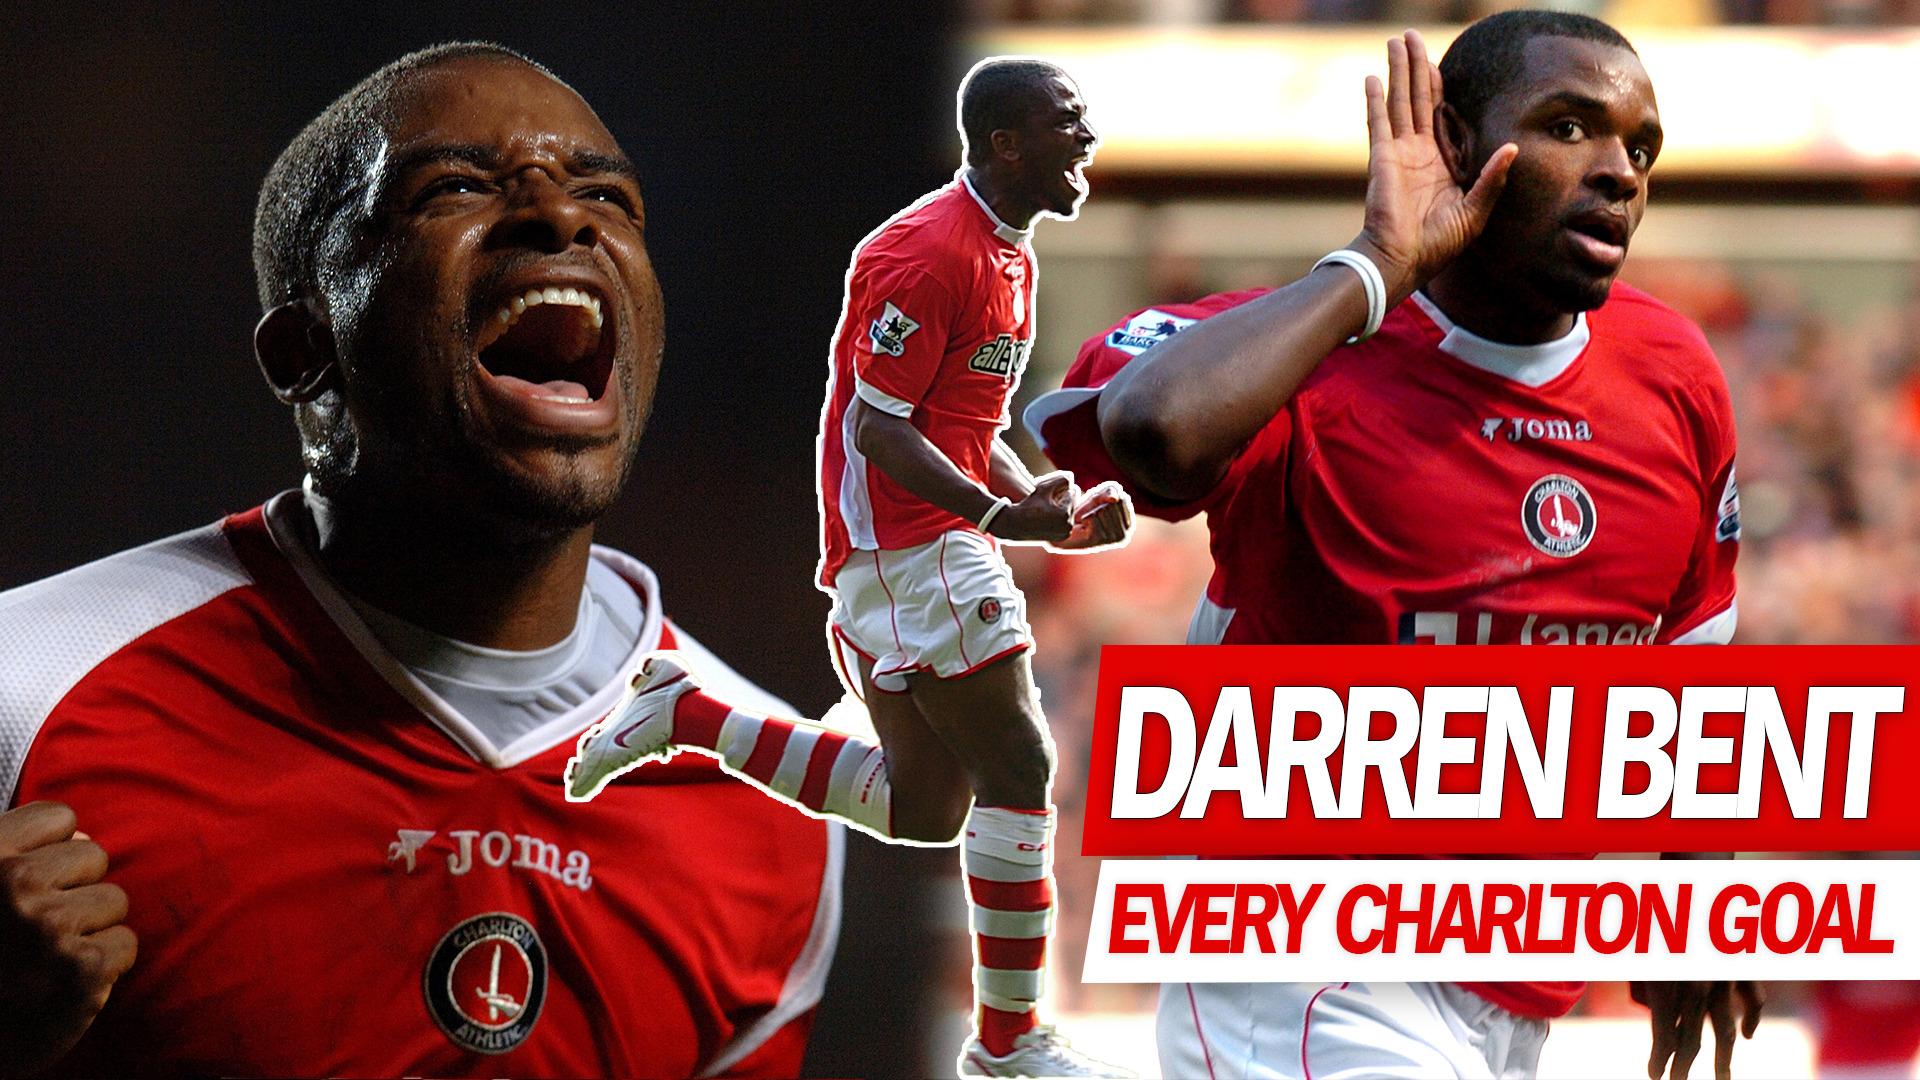 EVERY CHARLTON GOAL | Darren Bent